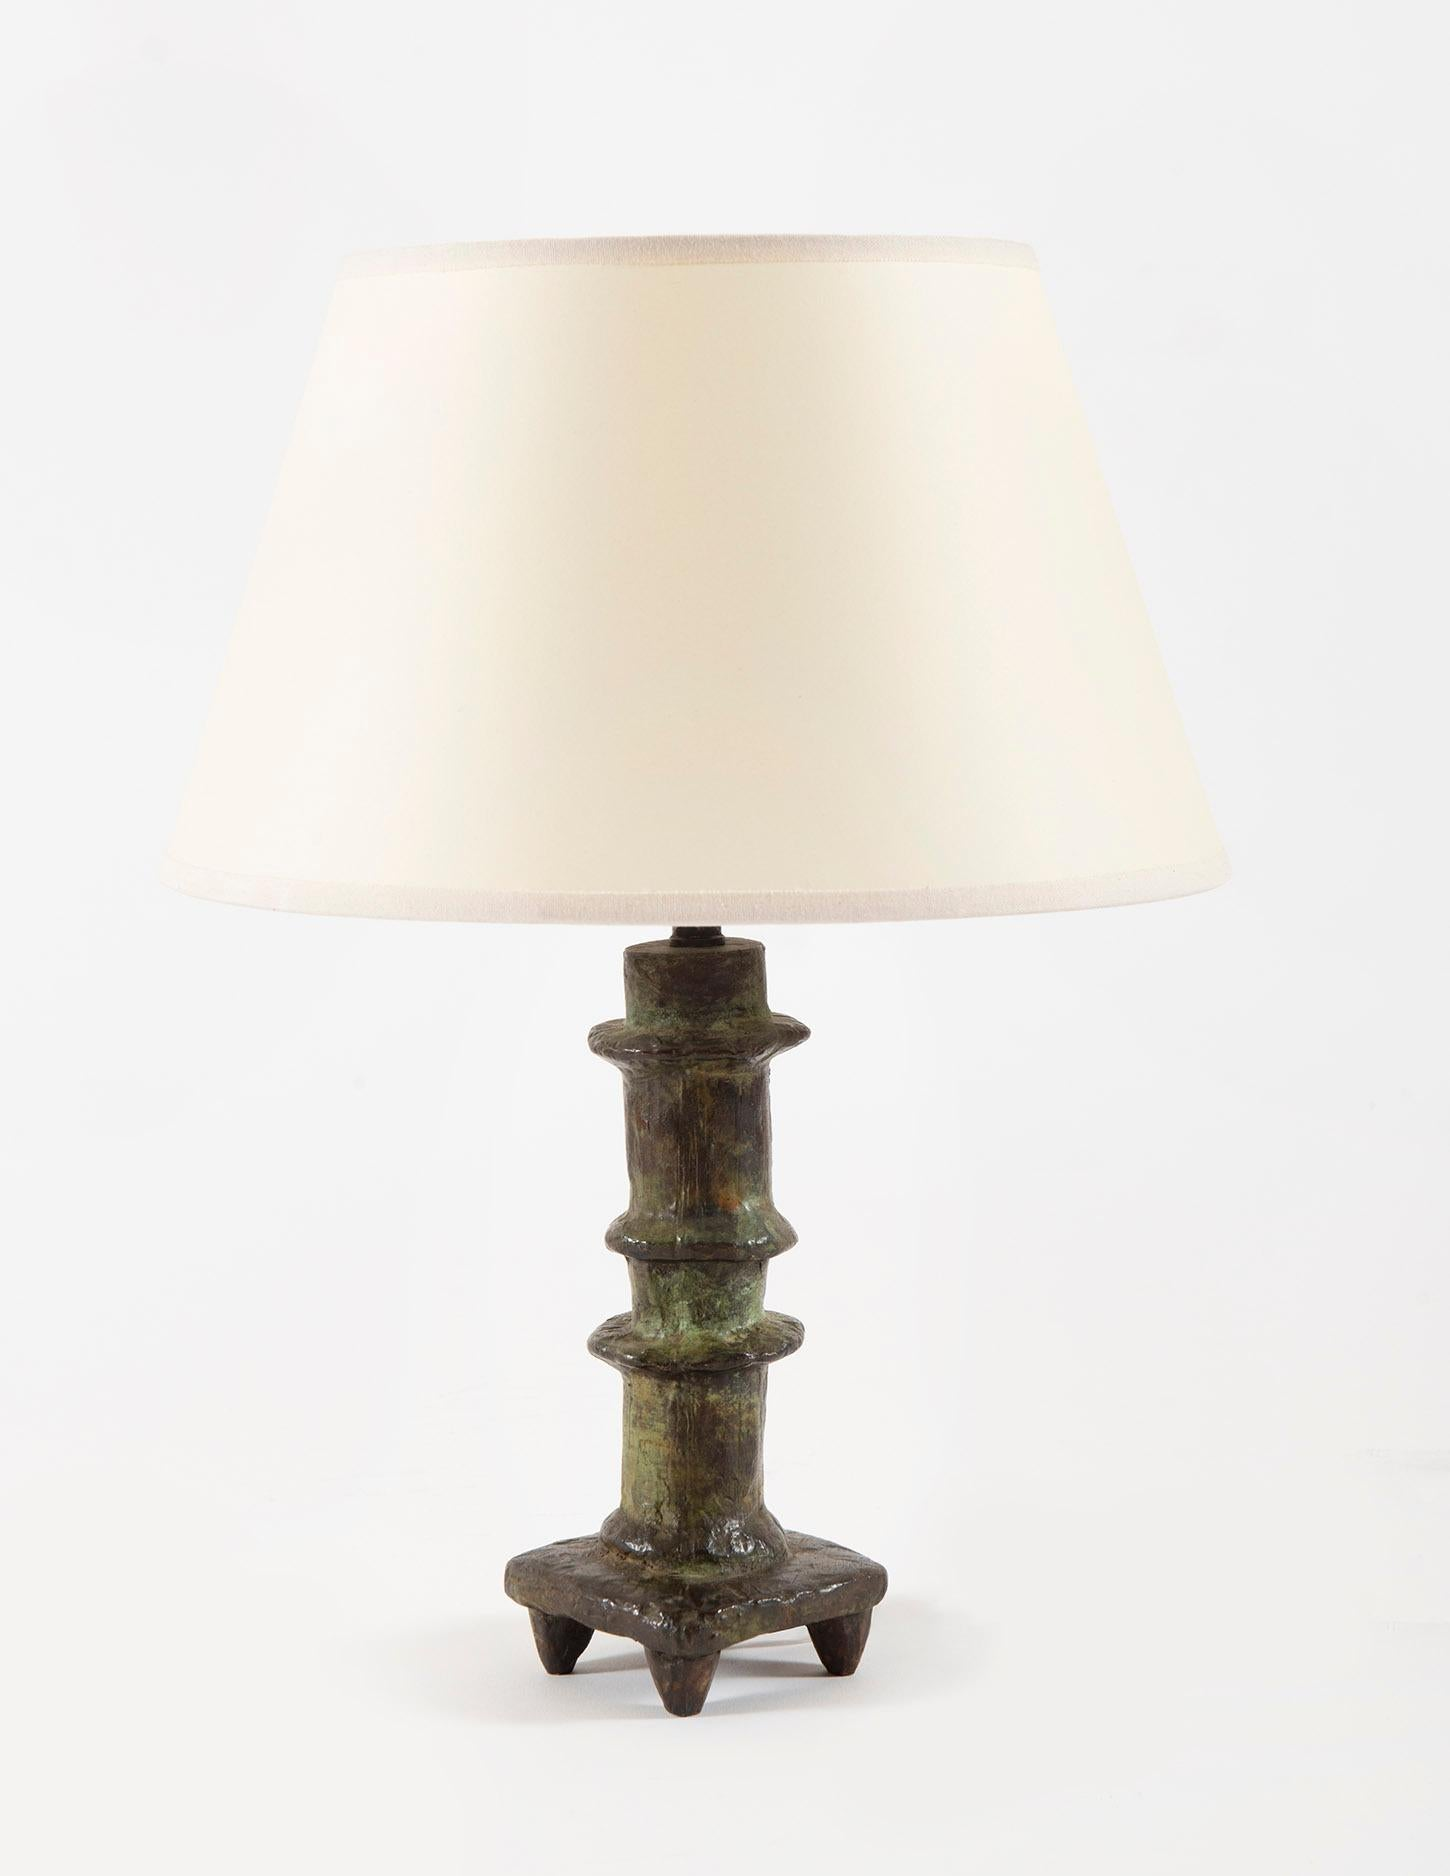 Lamp Petit Bougeoir, Diego Giacometti, 1960's, Design, Decorative Art, Bronze